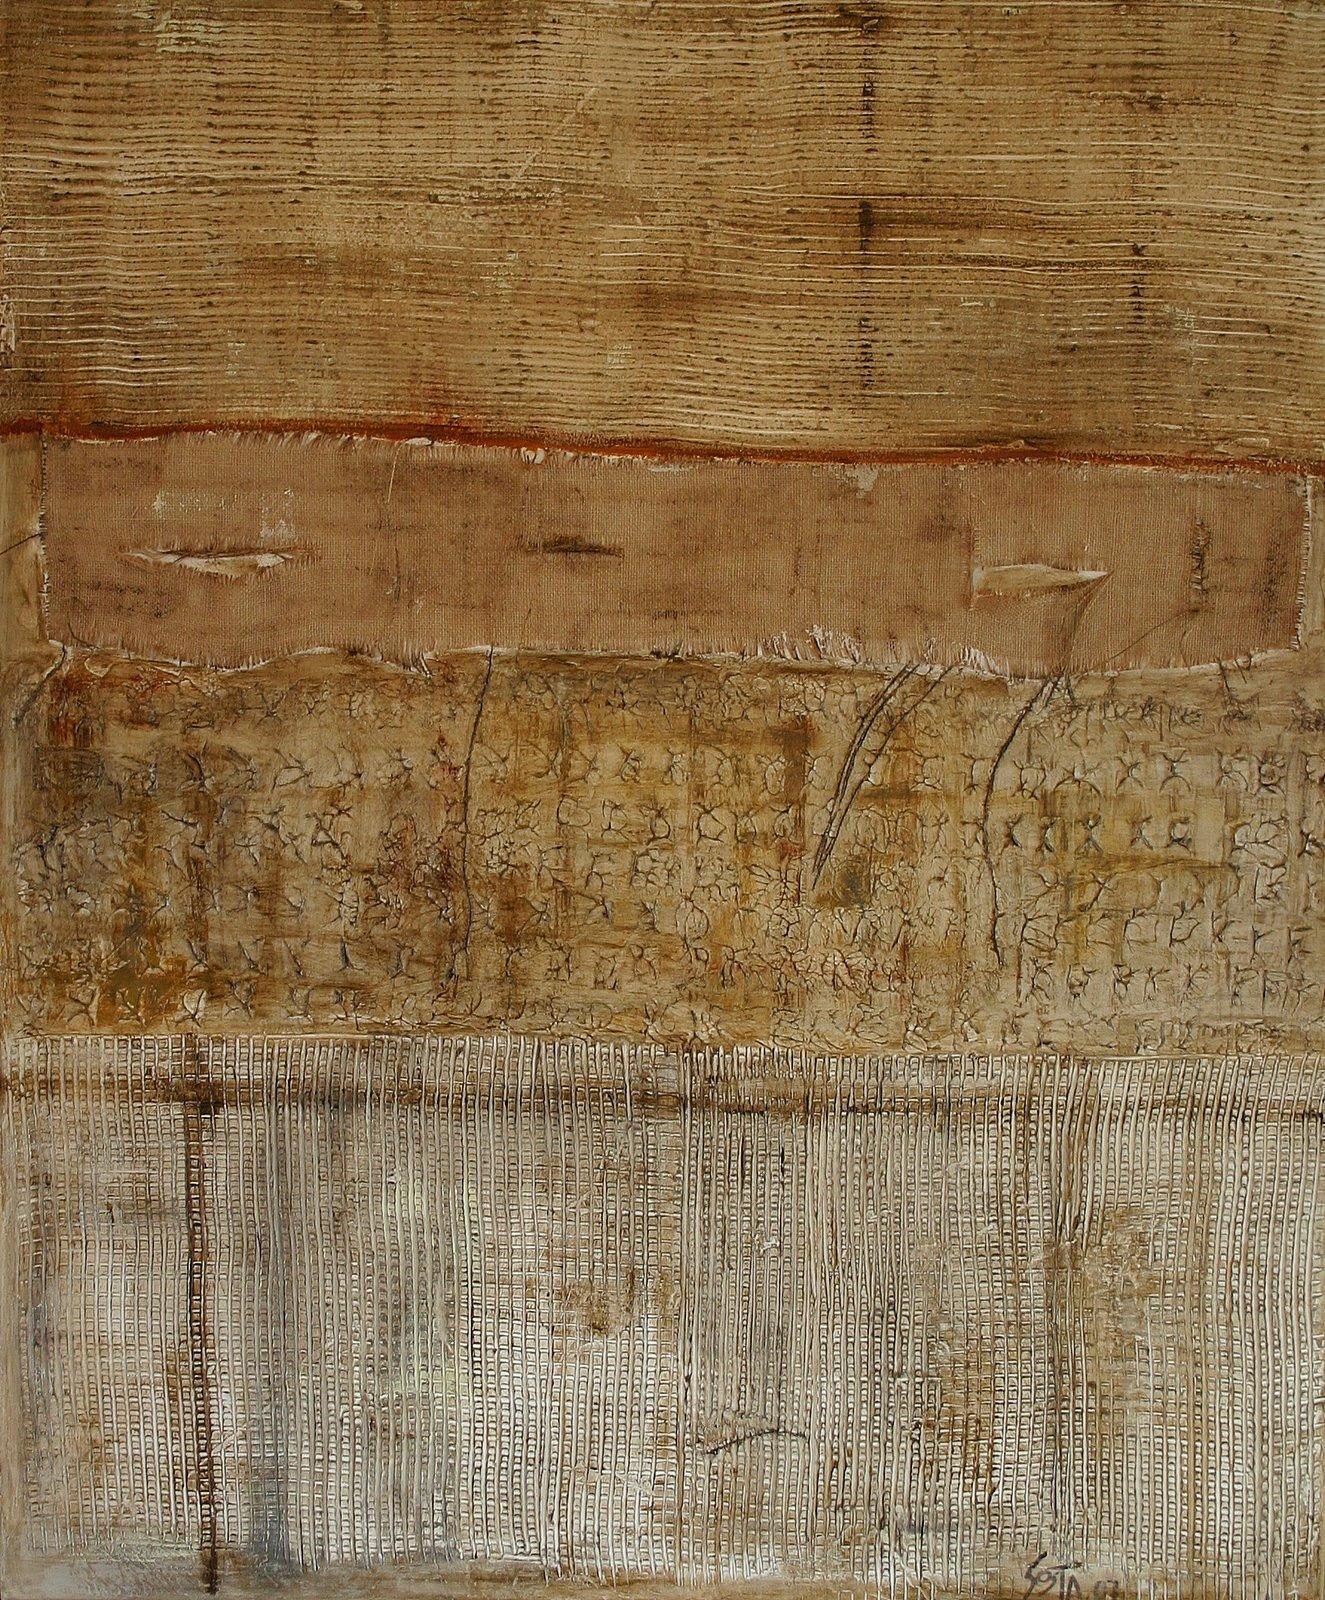 Tableau Contemporain, Trame (1). Sophie Costa, artiste peintre.